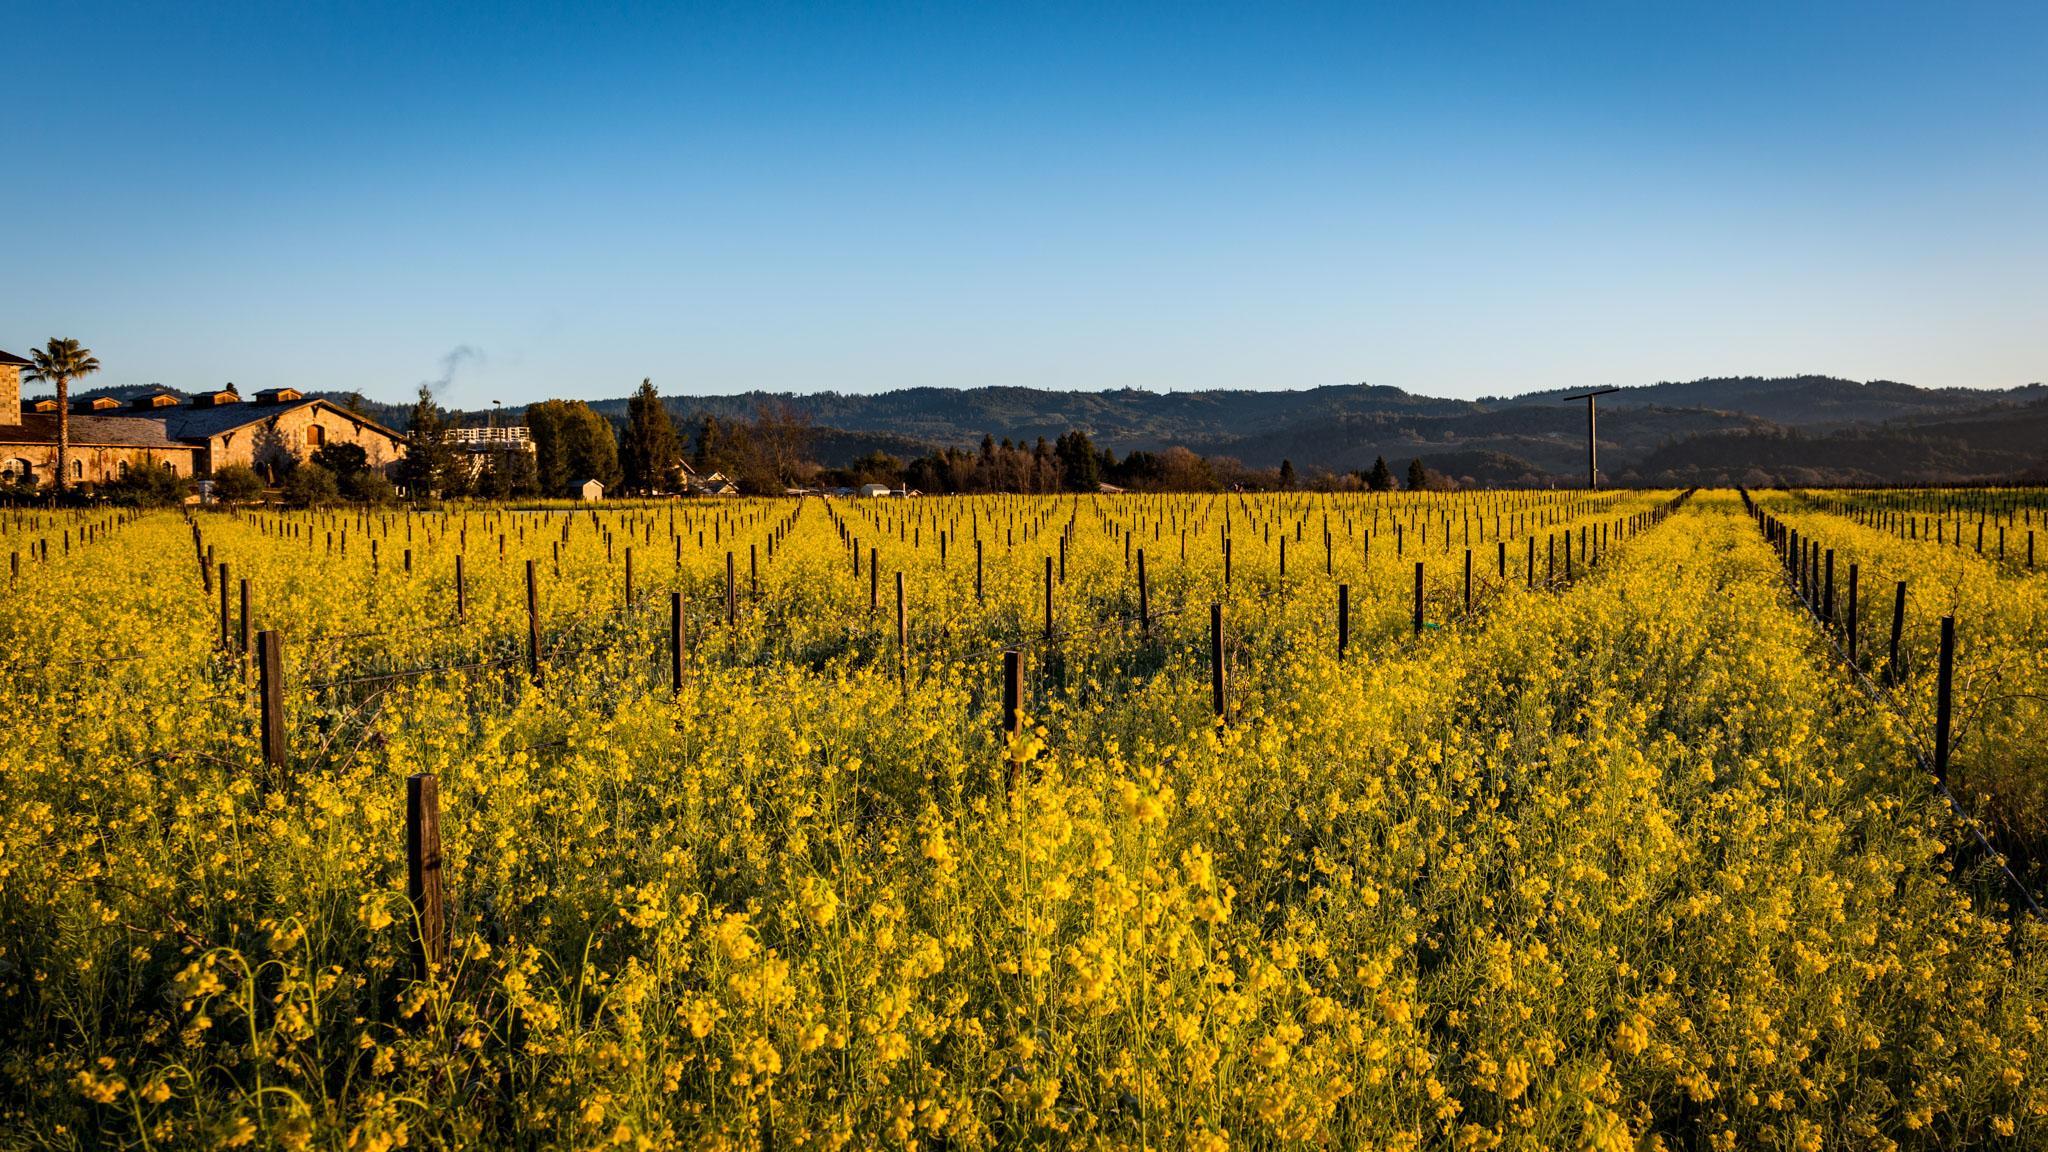 California : Napa Valley : Regusci Winery and mustard